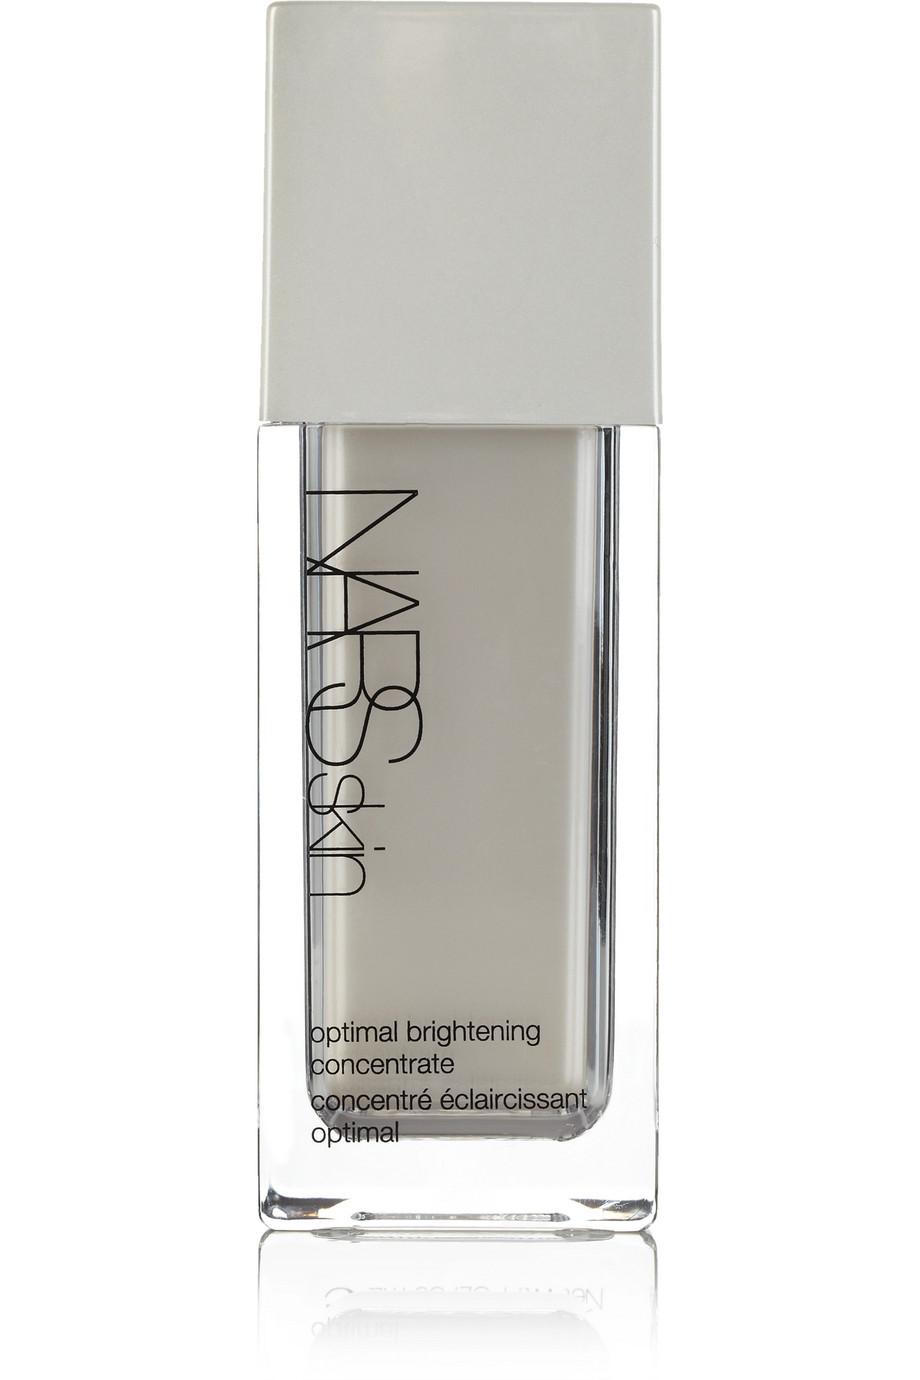 NARS NARSskin Optimal Brightening Concentrate, 30 ml – Serum